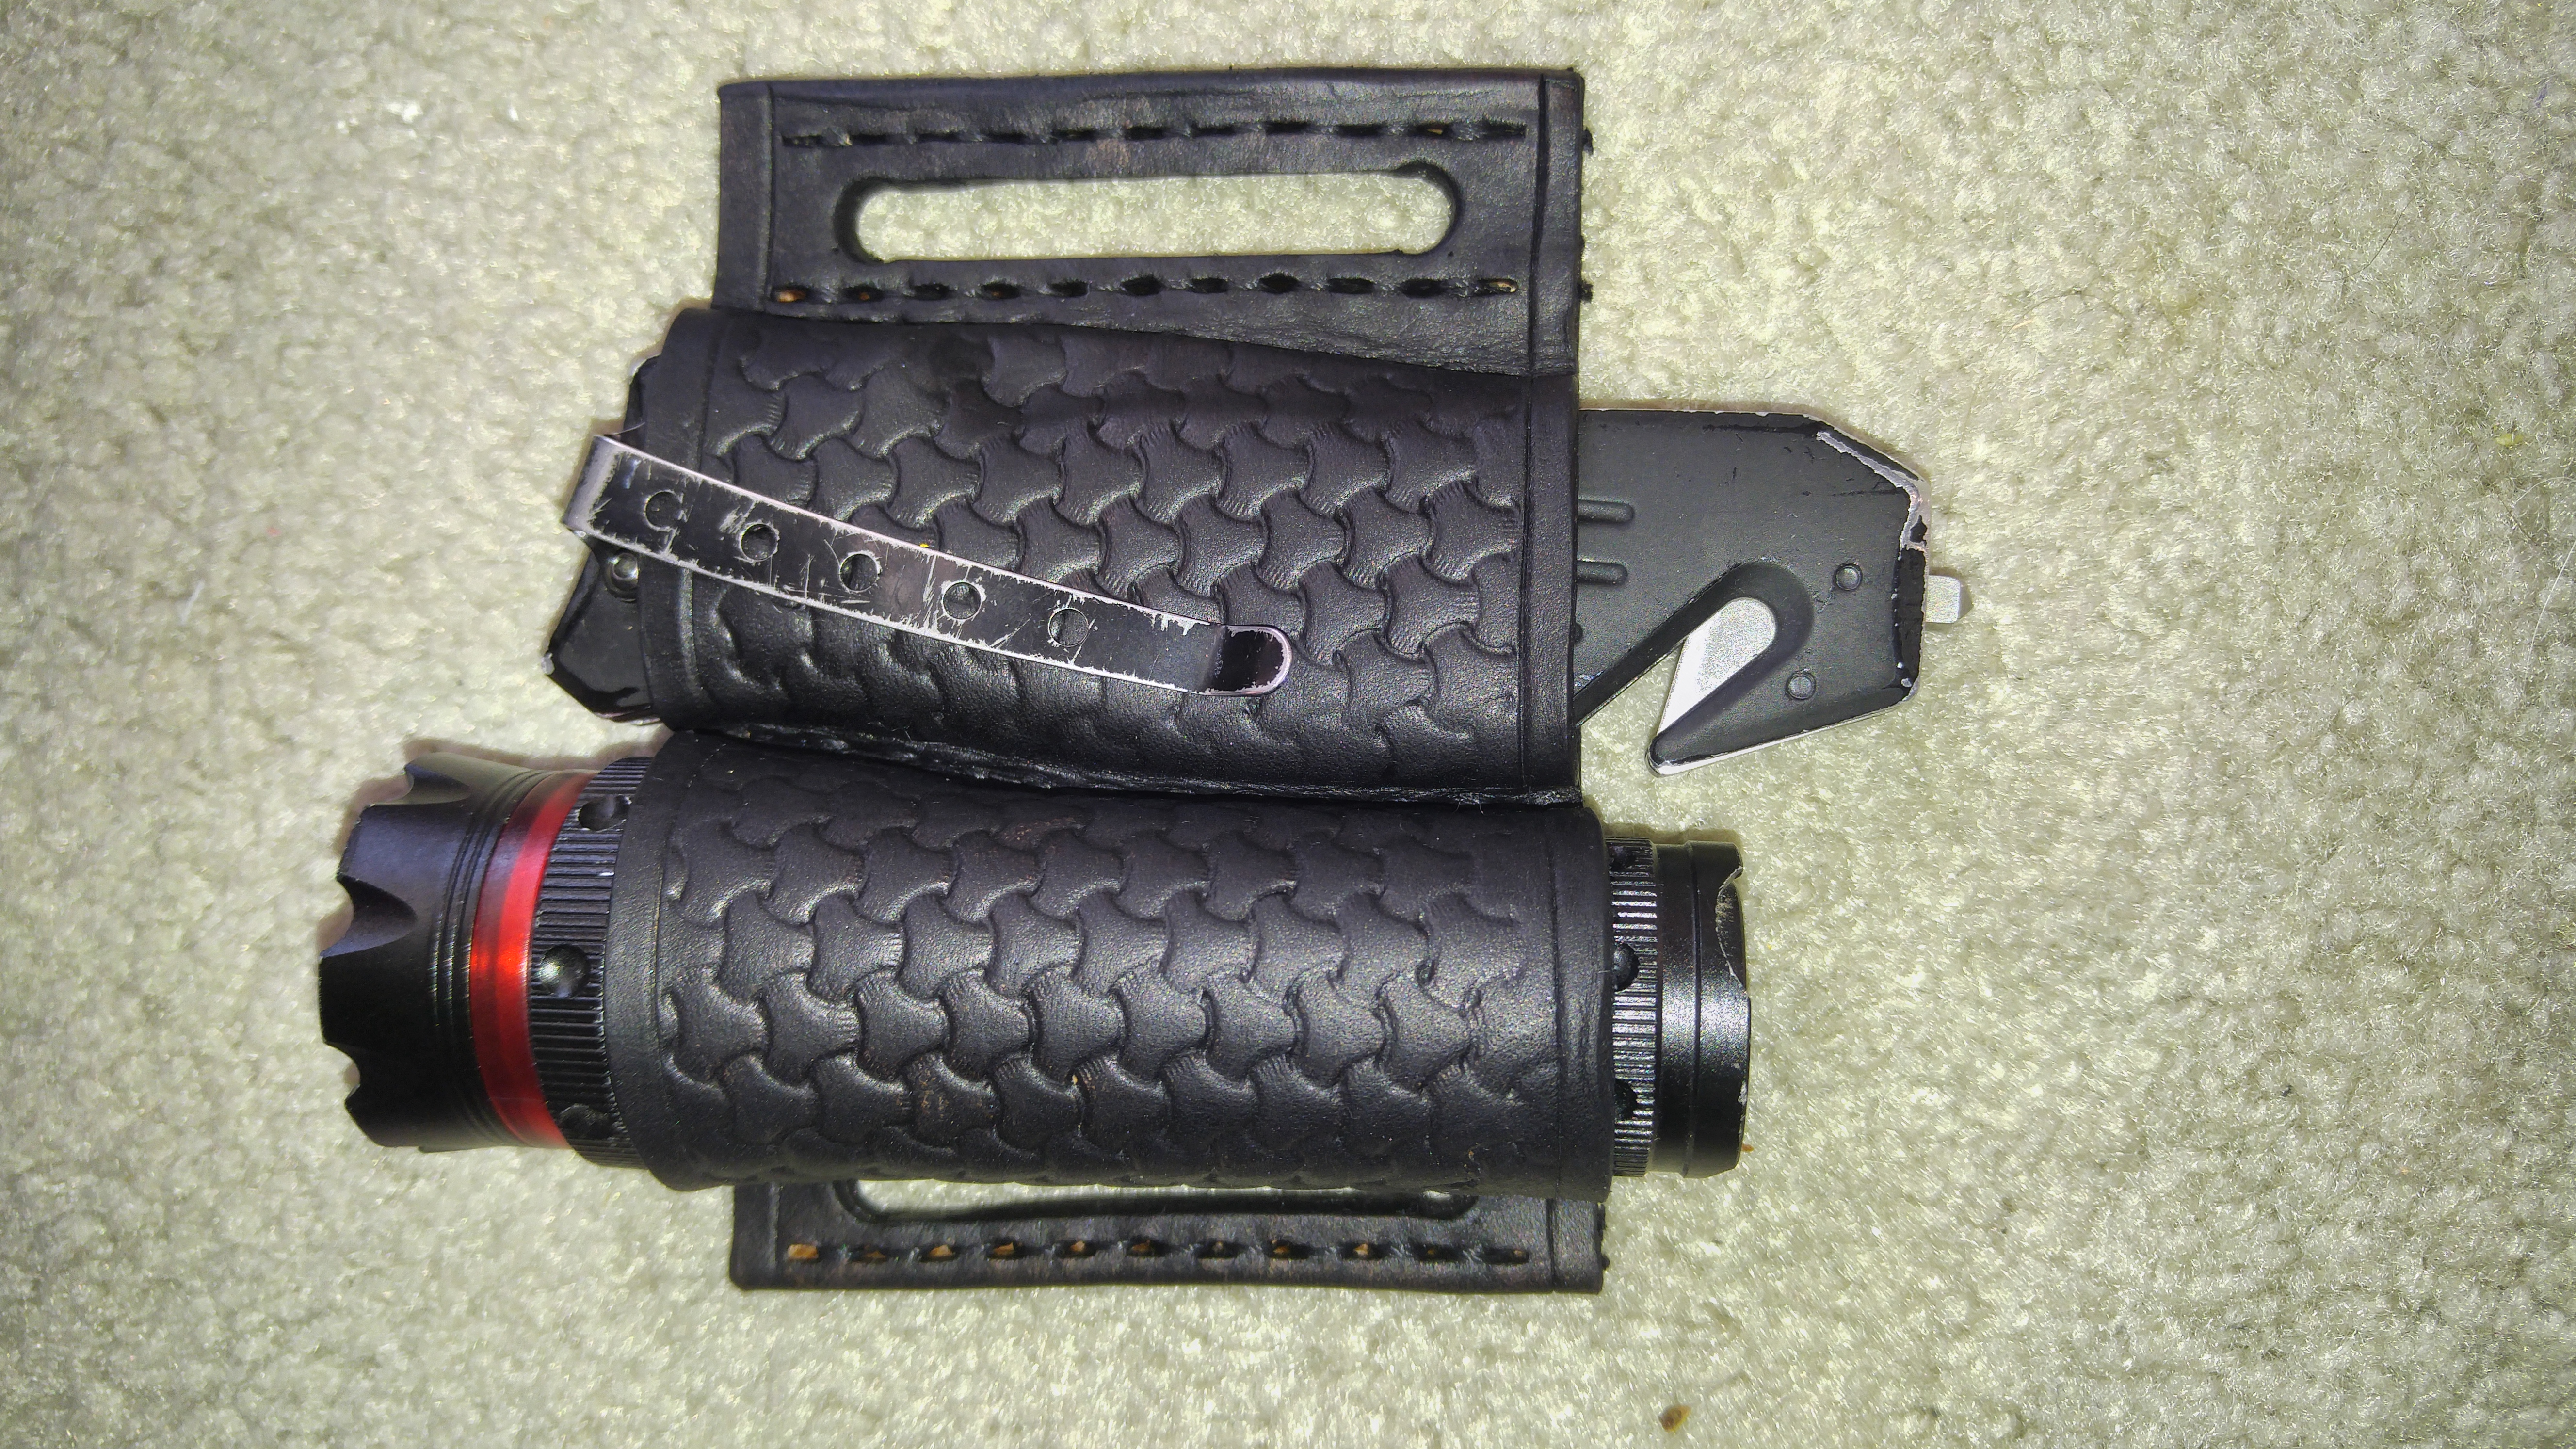 Flashlight and Pocket Knife- Batman Belt Sheath